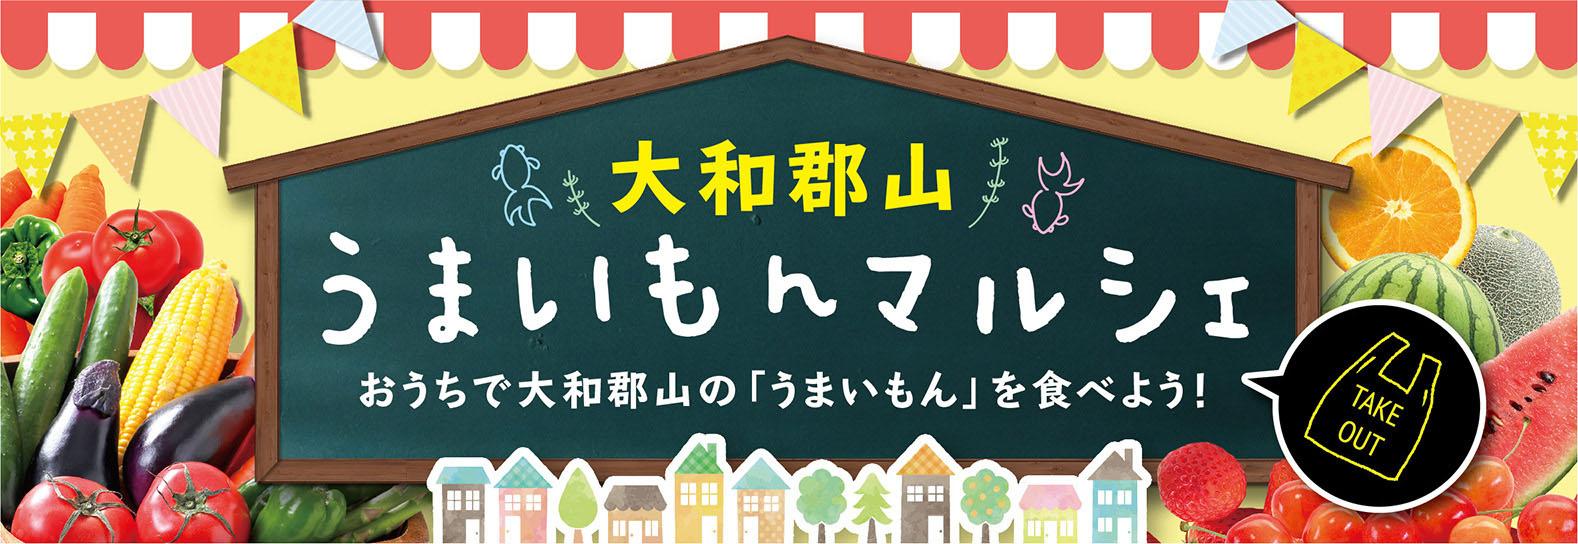 umaimon_yamatokoriyama.jpg